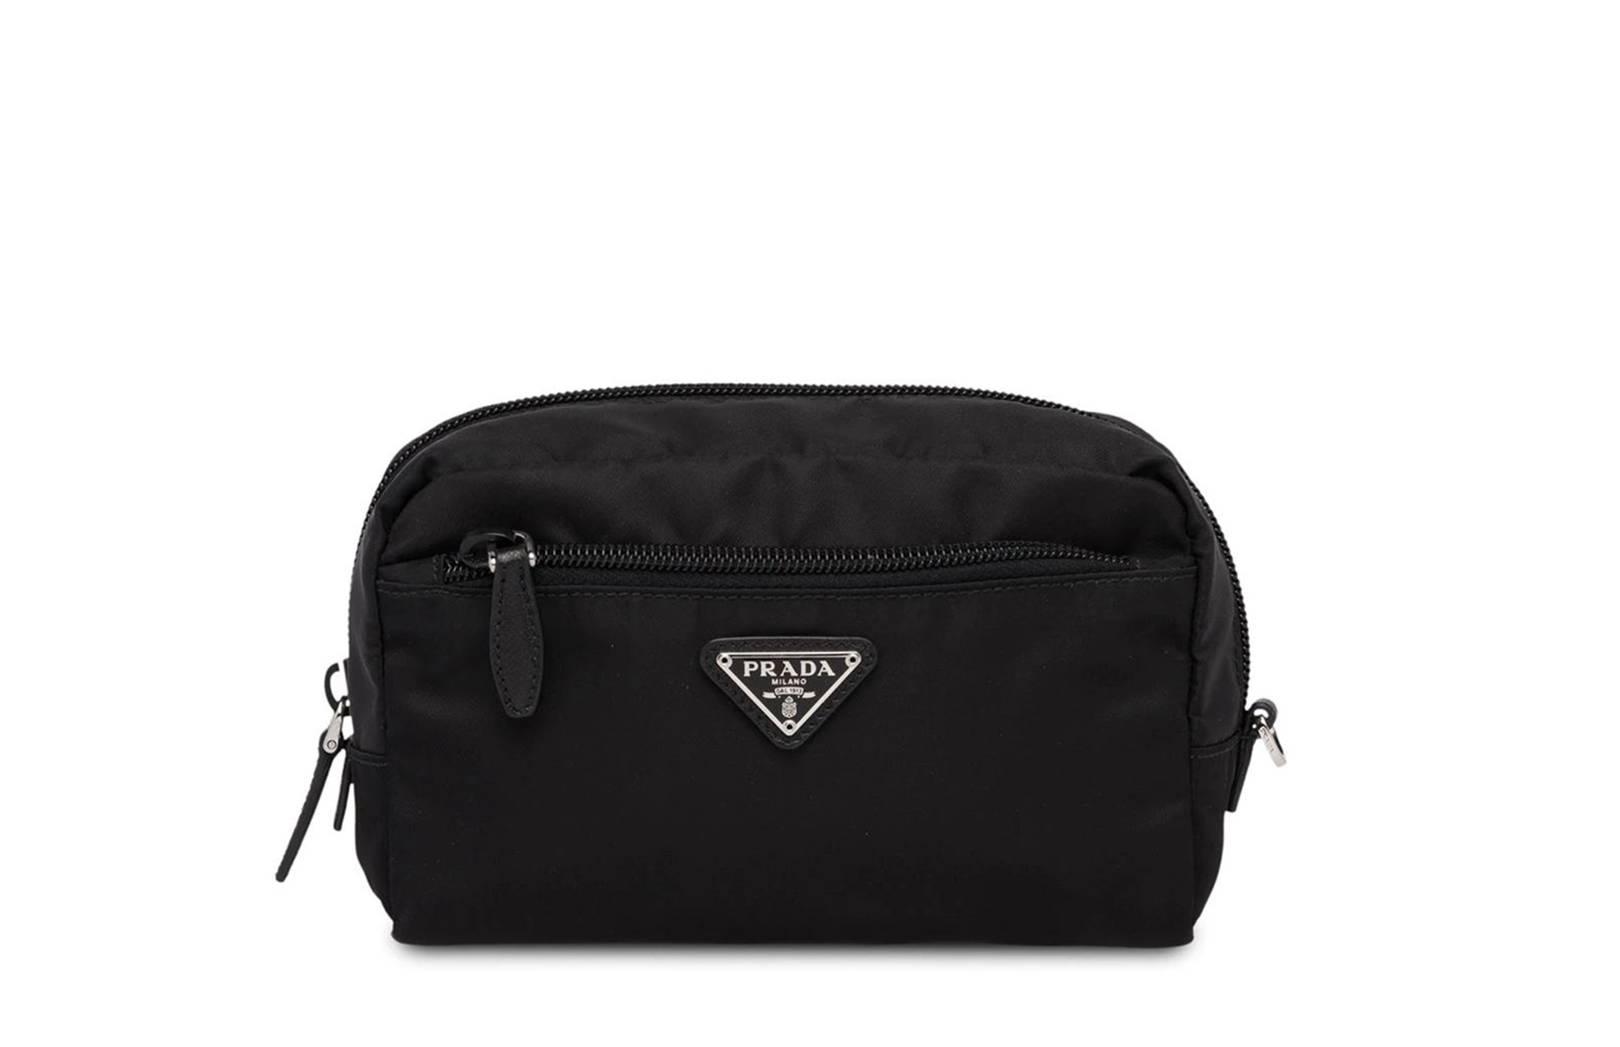 416b58a9a6eb5b Makeup Bags   10 Best Designer Pieces To Buy Now   British Vogue